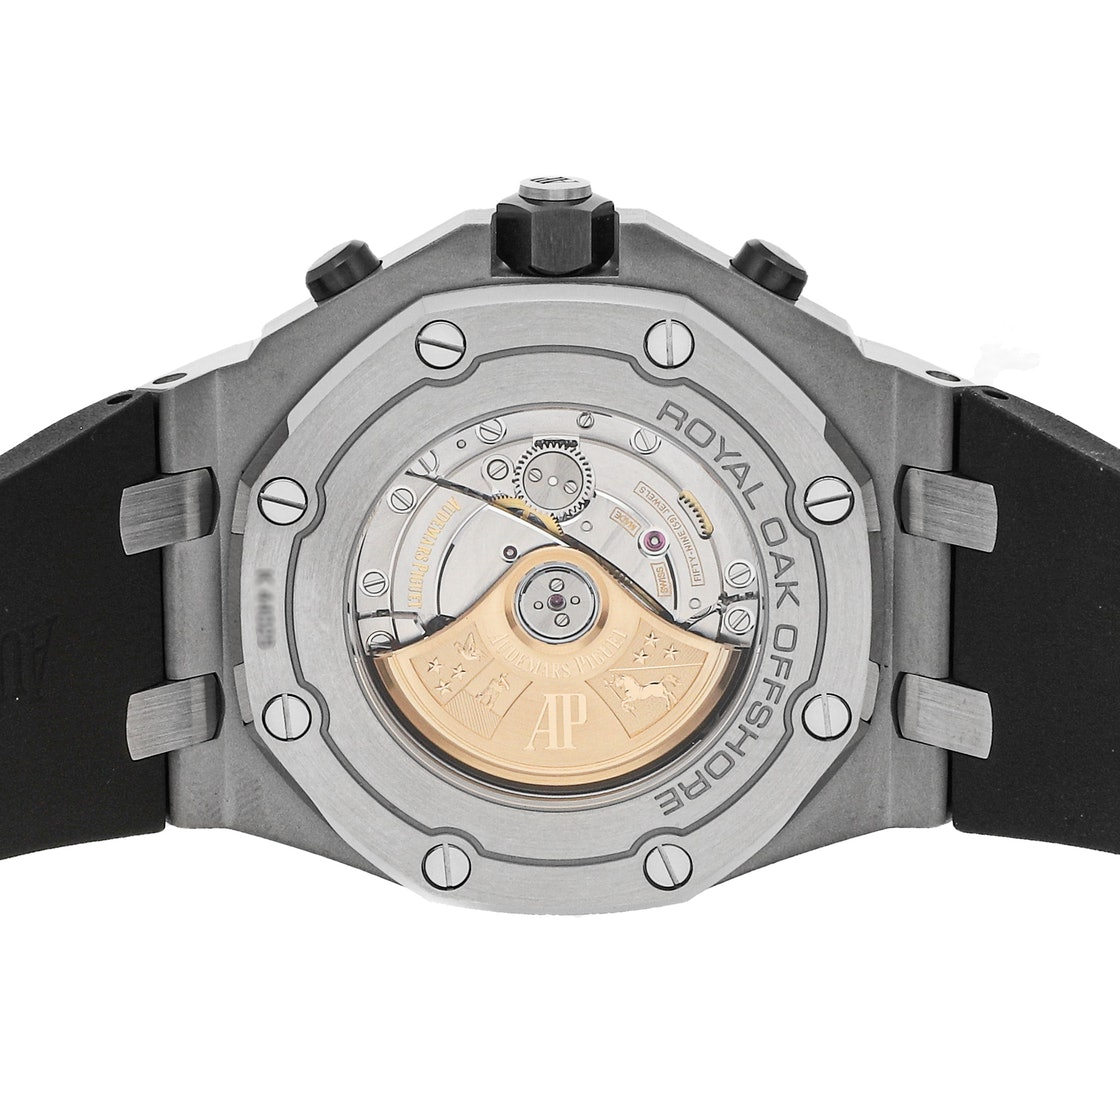 Audemars Piguet Royal Oak Offshore Chronograph 26470ST.OO.A028CR.01